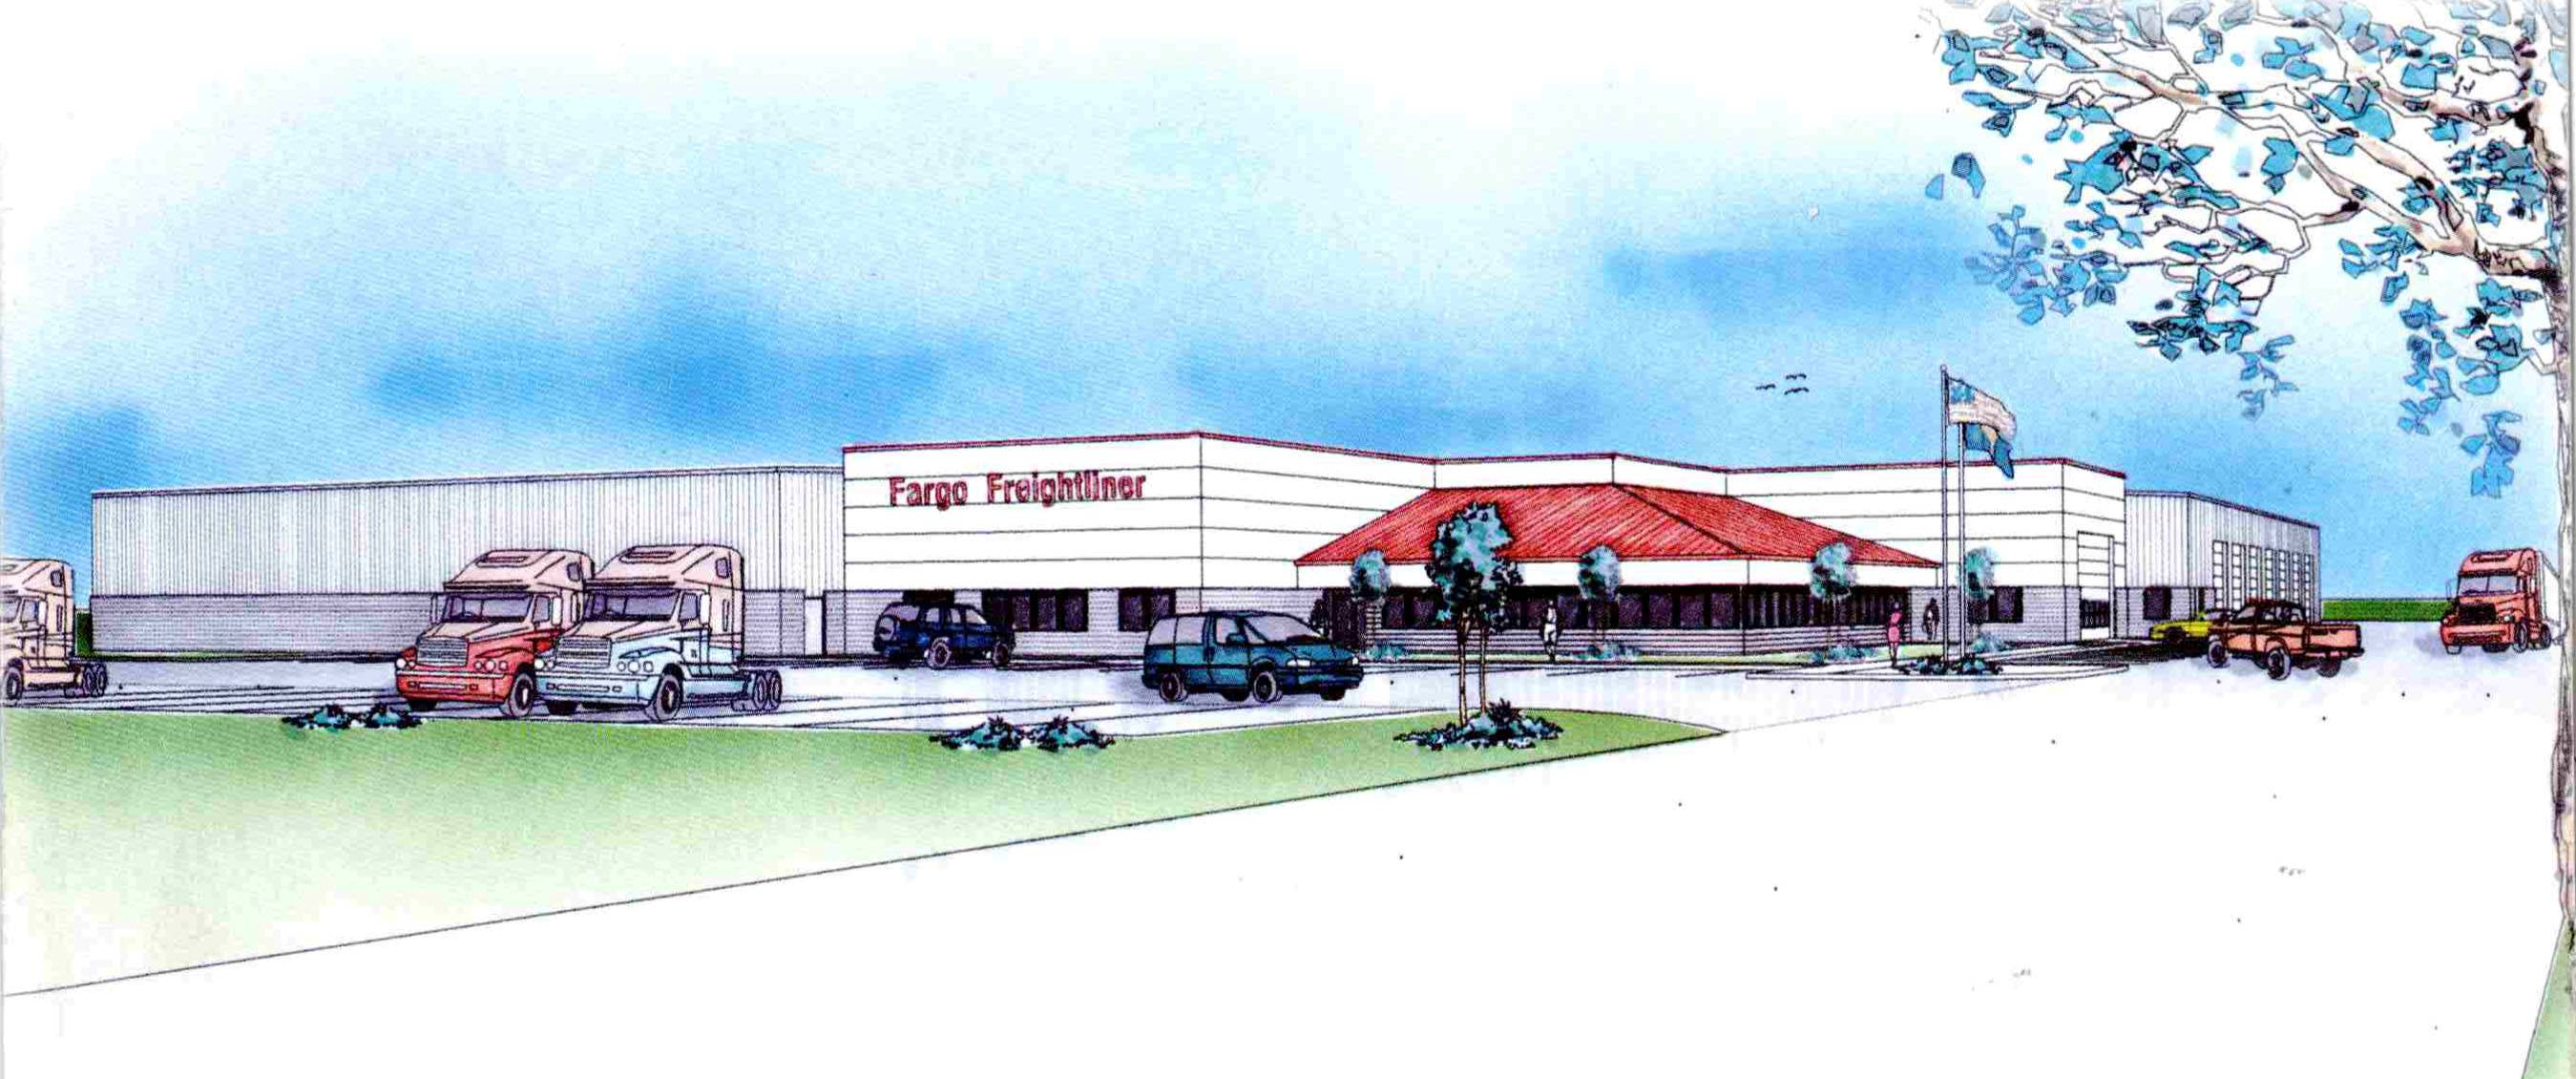 Fargo Freightliner artist rendering